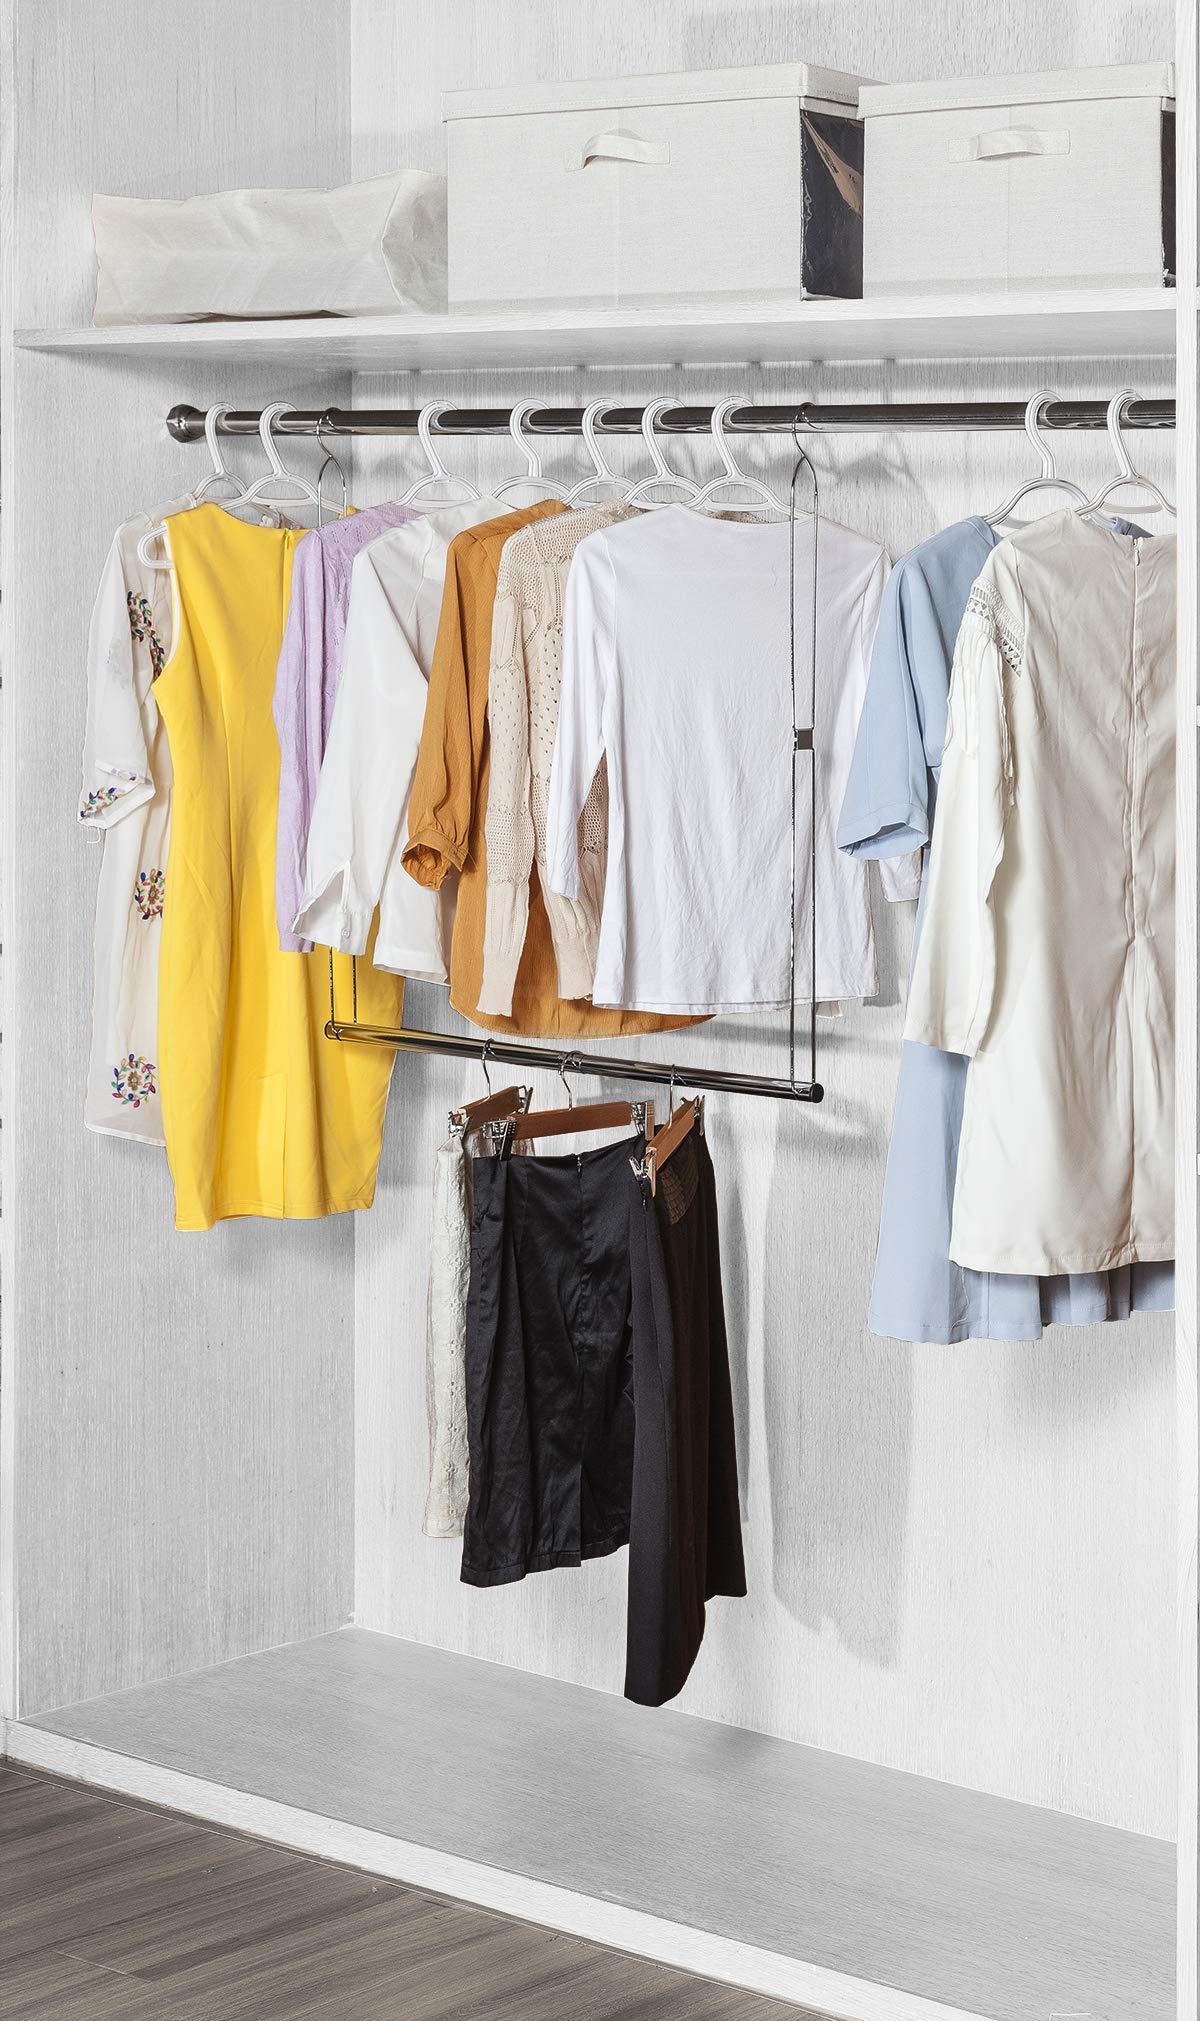 STORAGE MANIAC 2-Pack Adjustable Hanging Closet Rod, Double Hanging Closet Rod Organizer with Adjustable Horizontal Rod, Chrome by STORAGE MANIAC (Image #3)